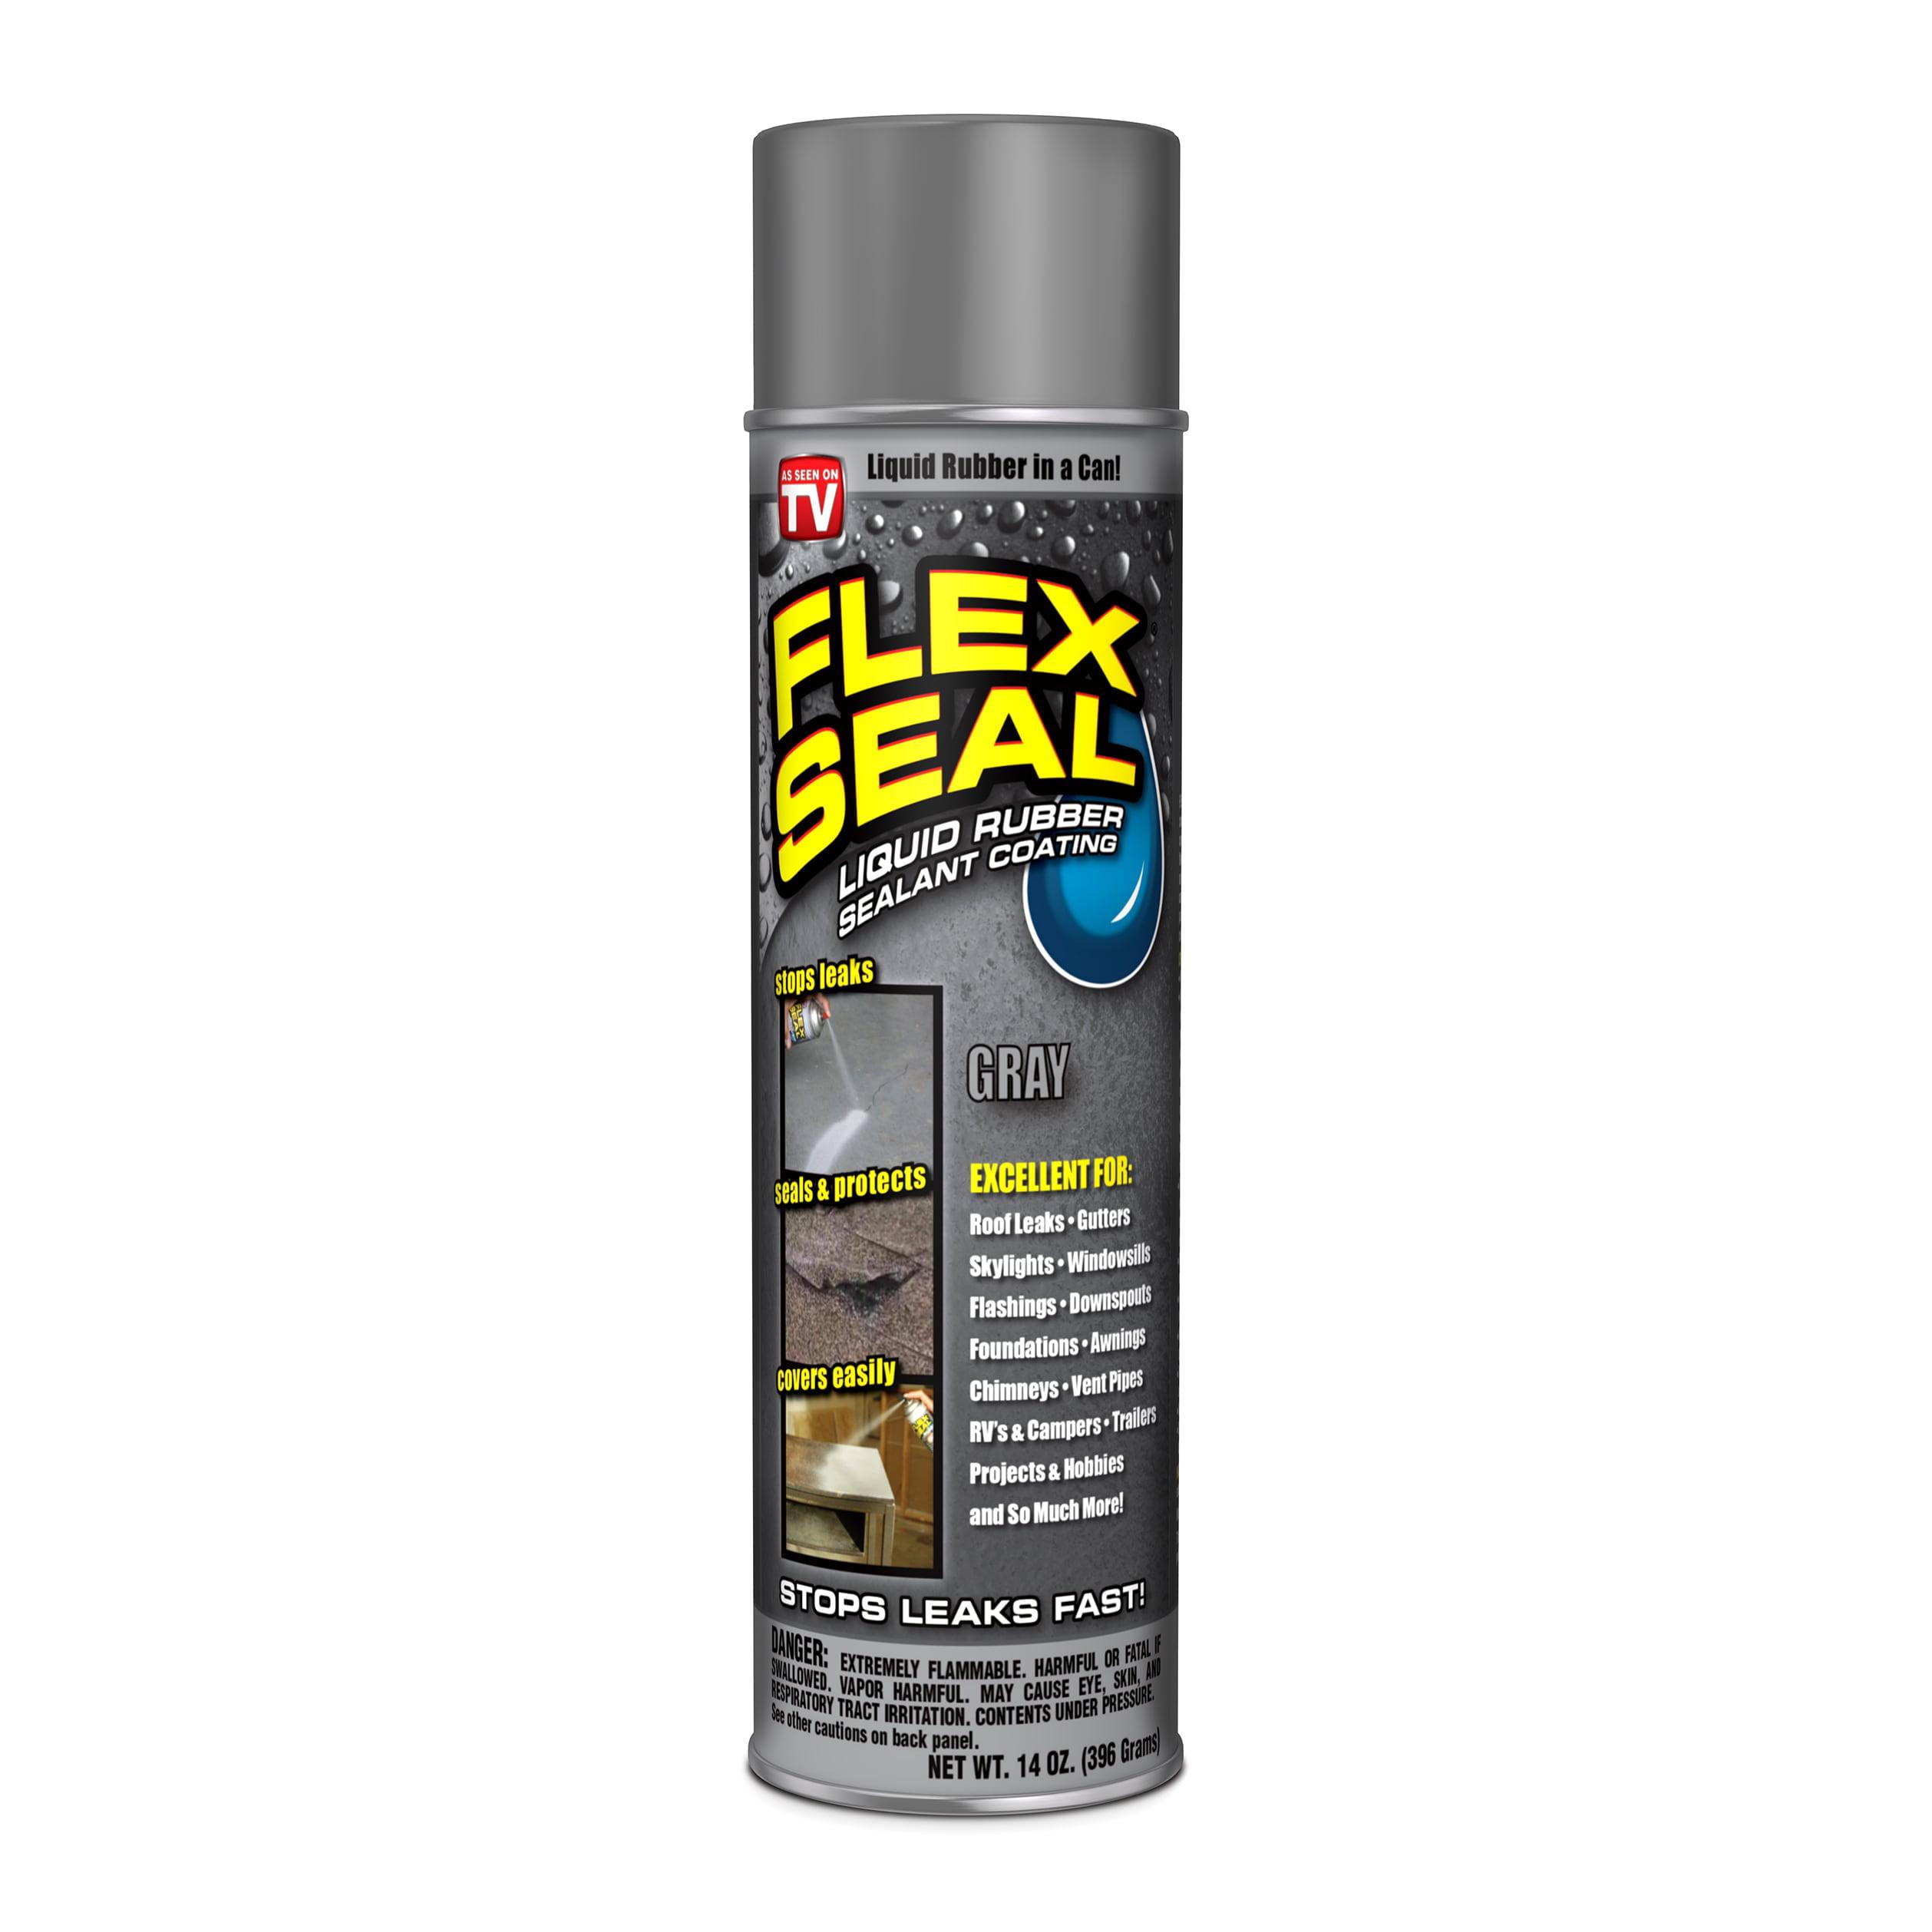 1a2ab95781a670 Flex Seal Spray Rubber Sealant Coating